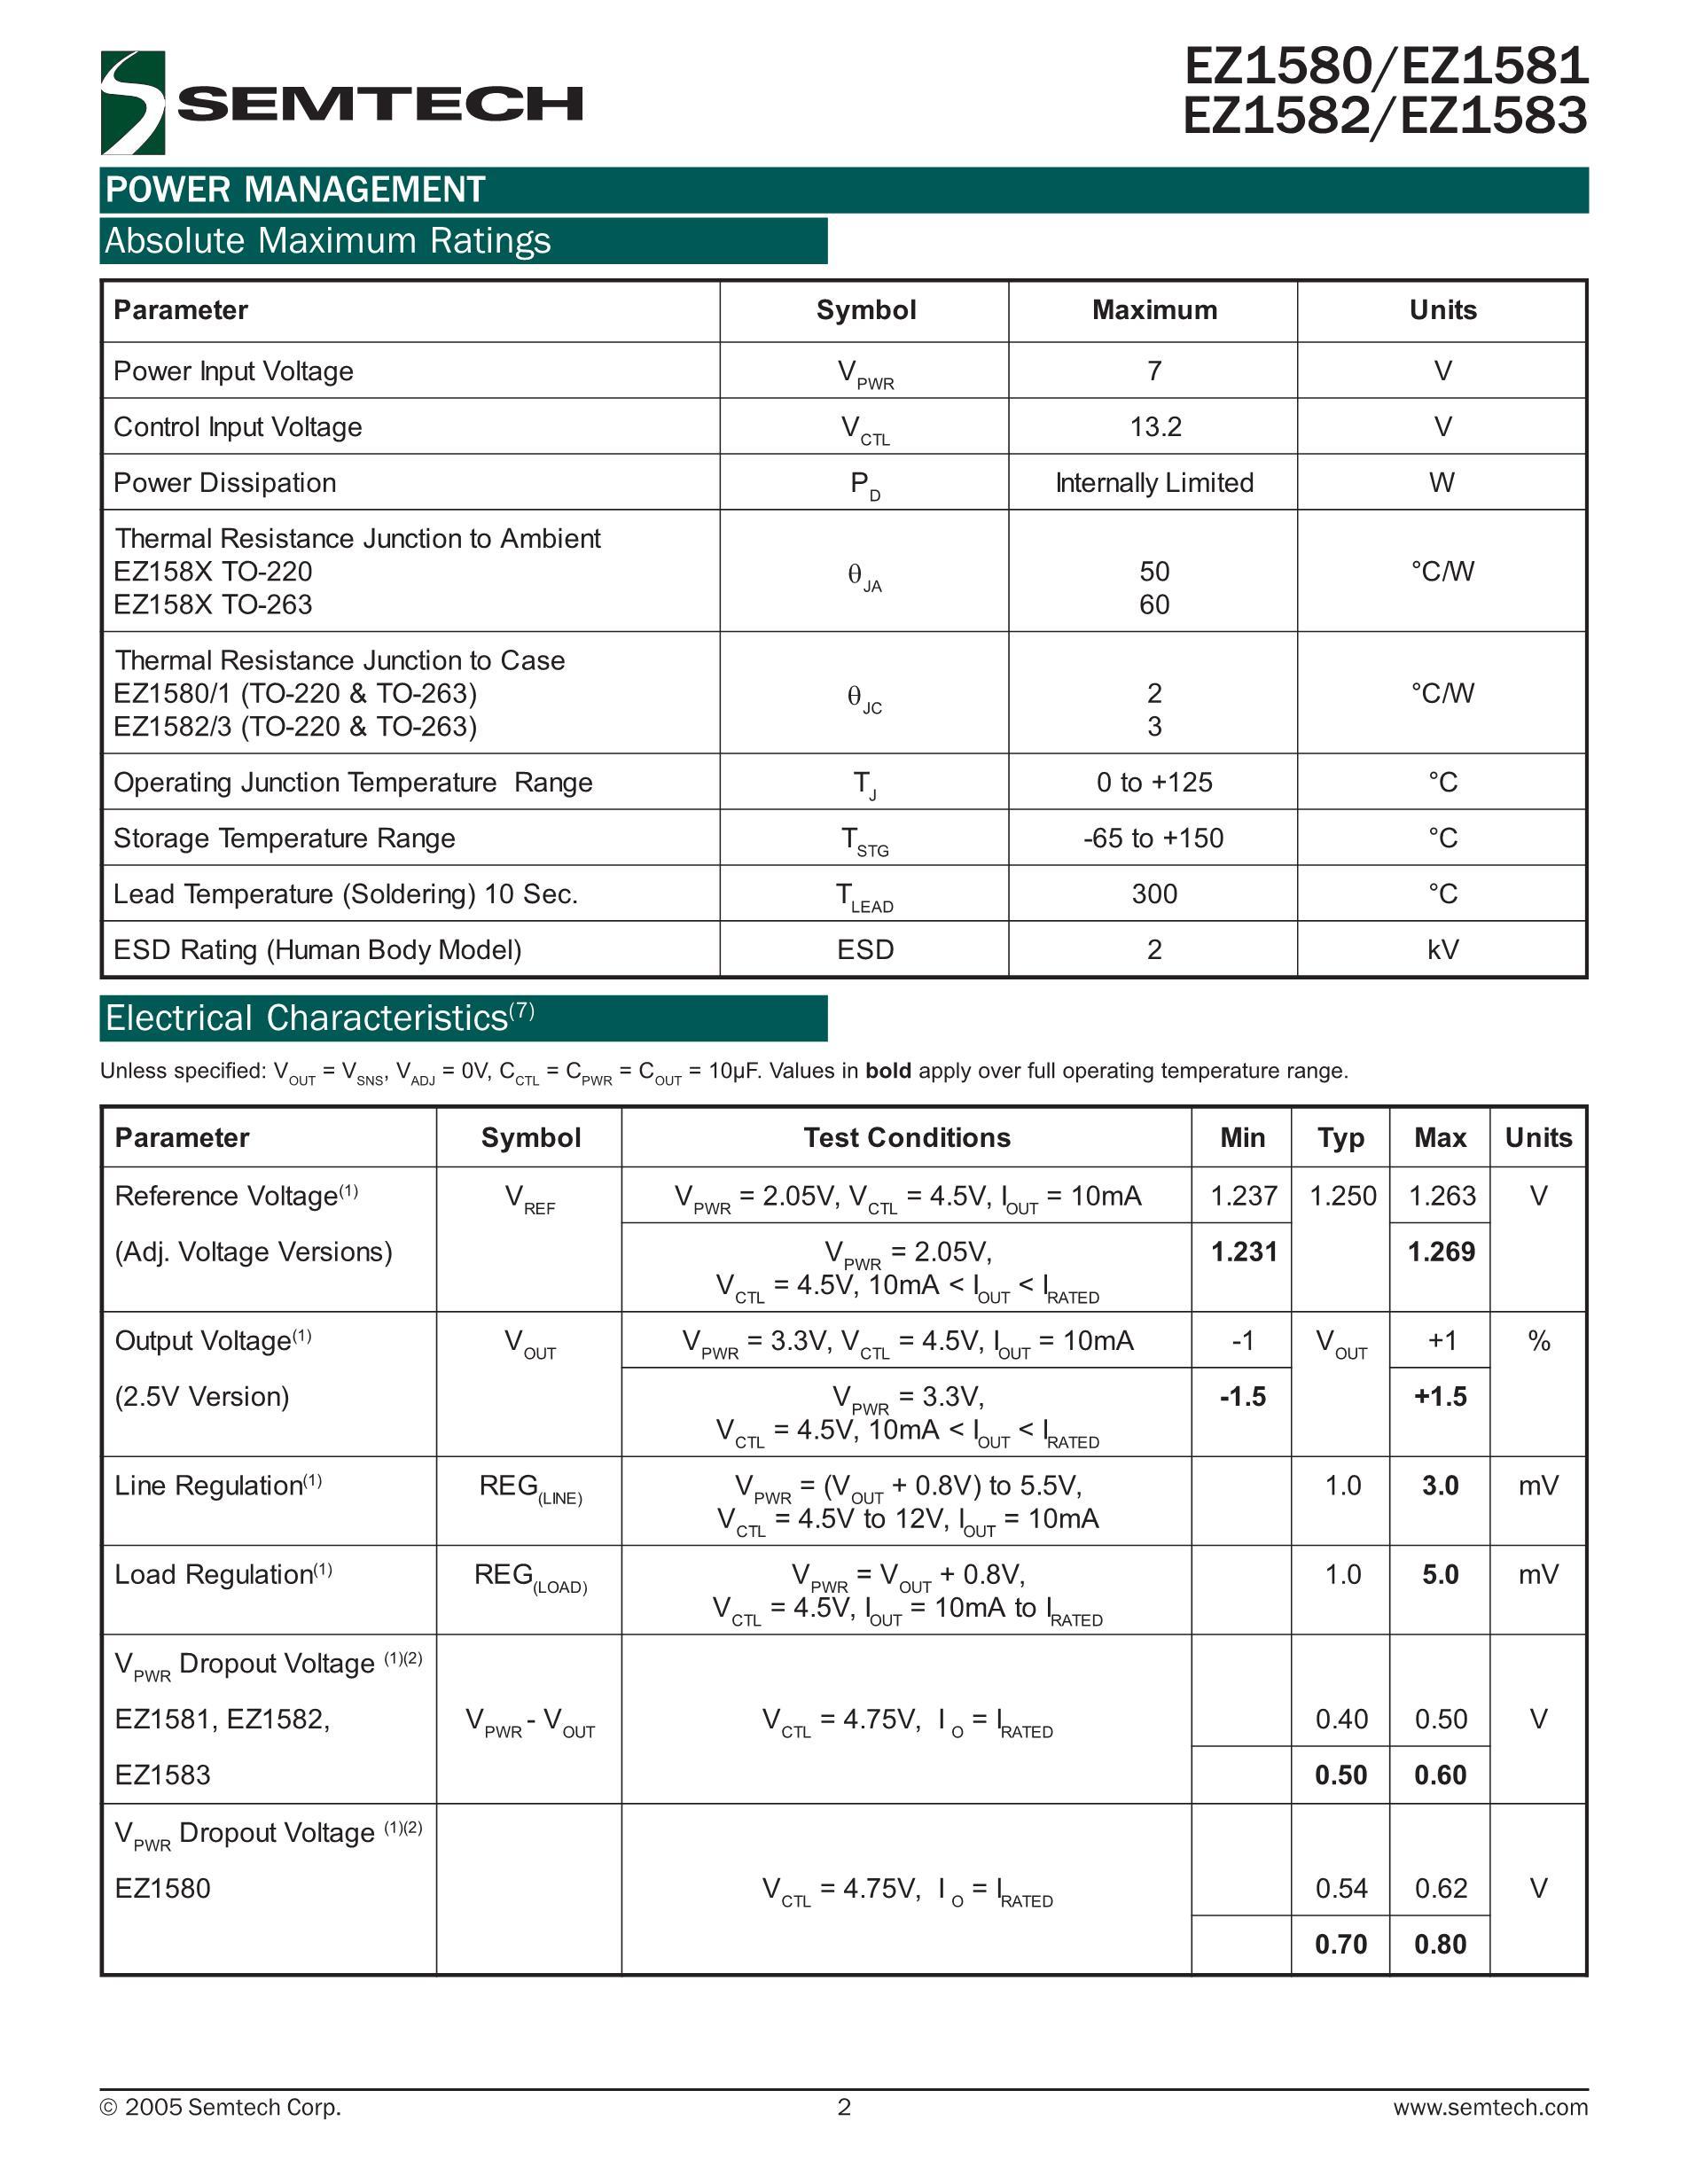 CM-2M2012-181JT's pdf picture 2